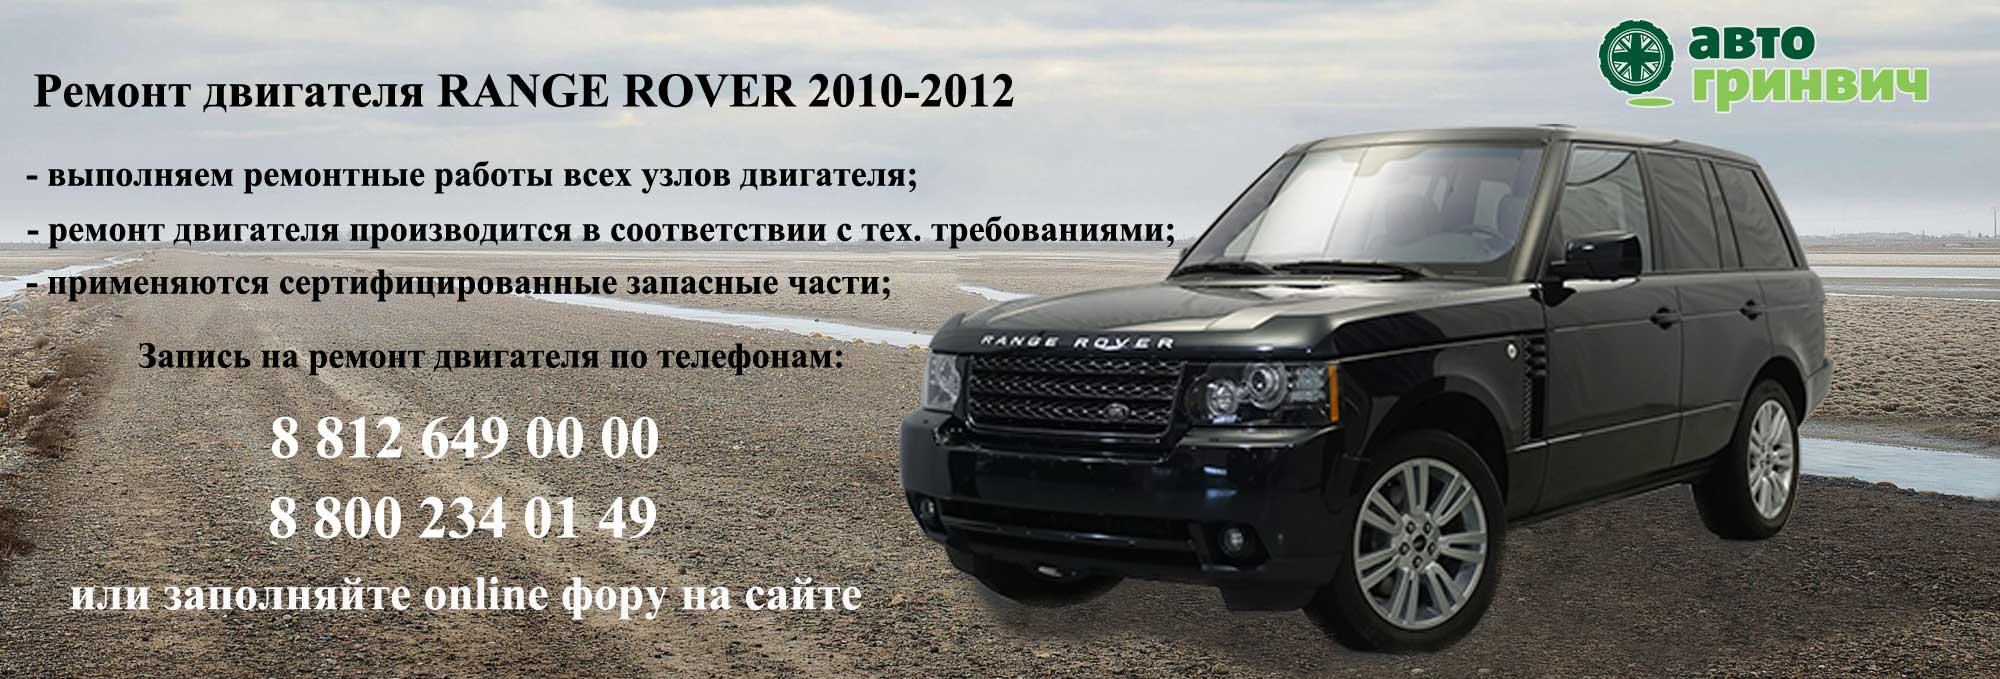 Ремонт двигателя Range Rover 2010-2012